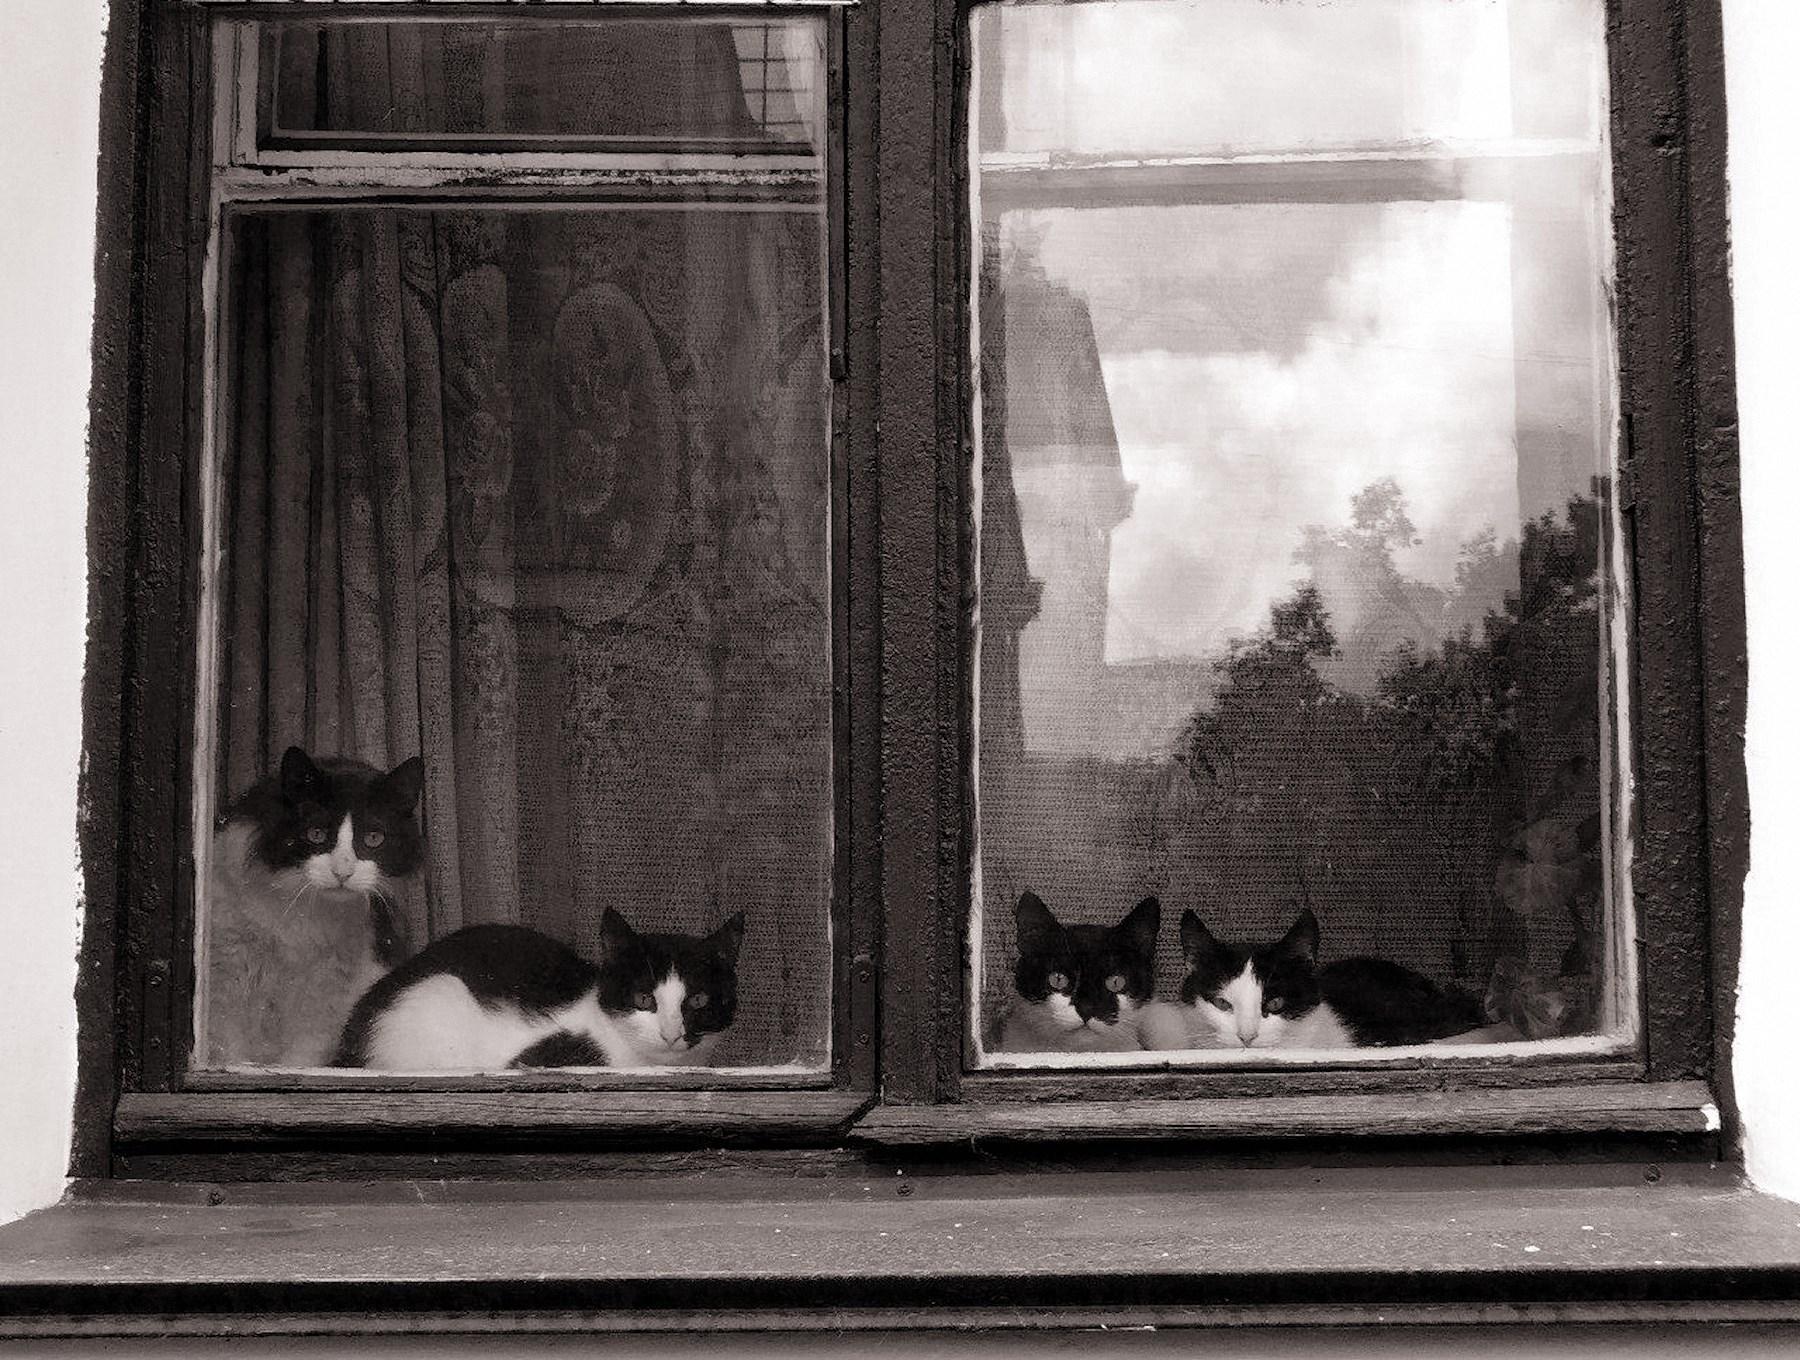 00 Olga Ilyina. The Masters of This House. 2015